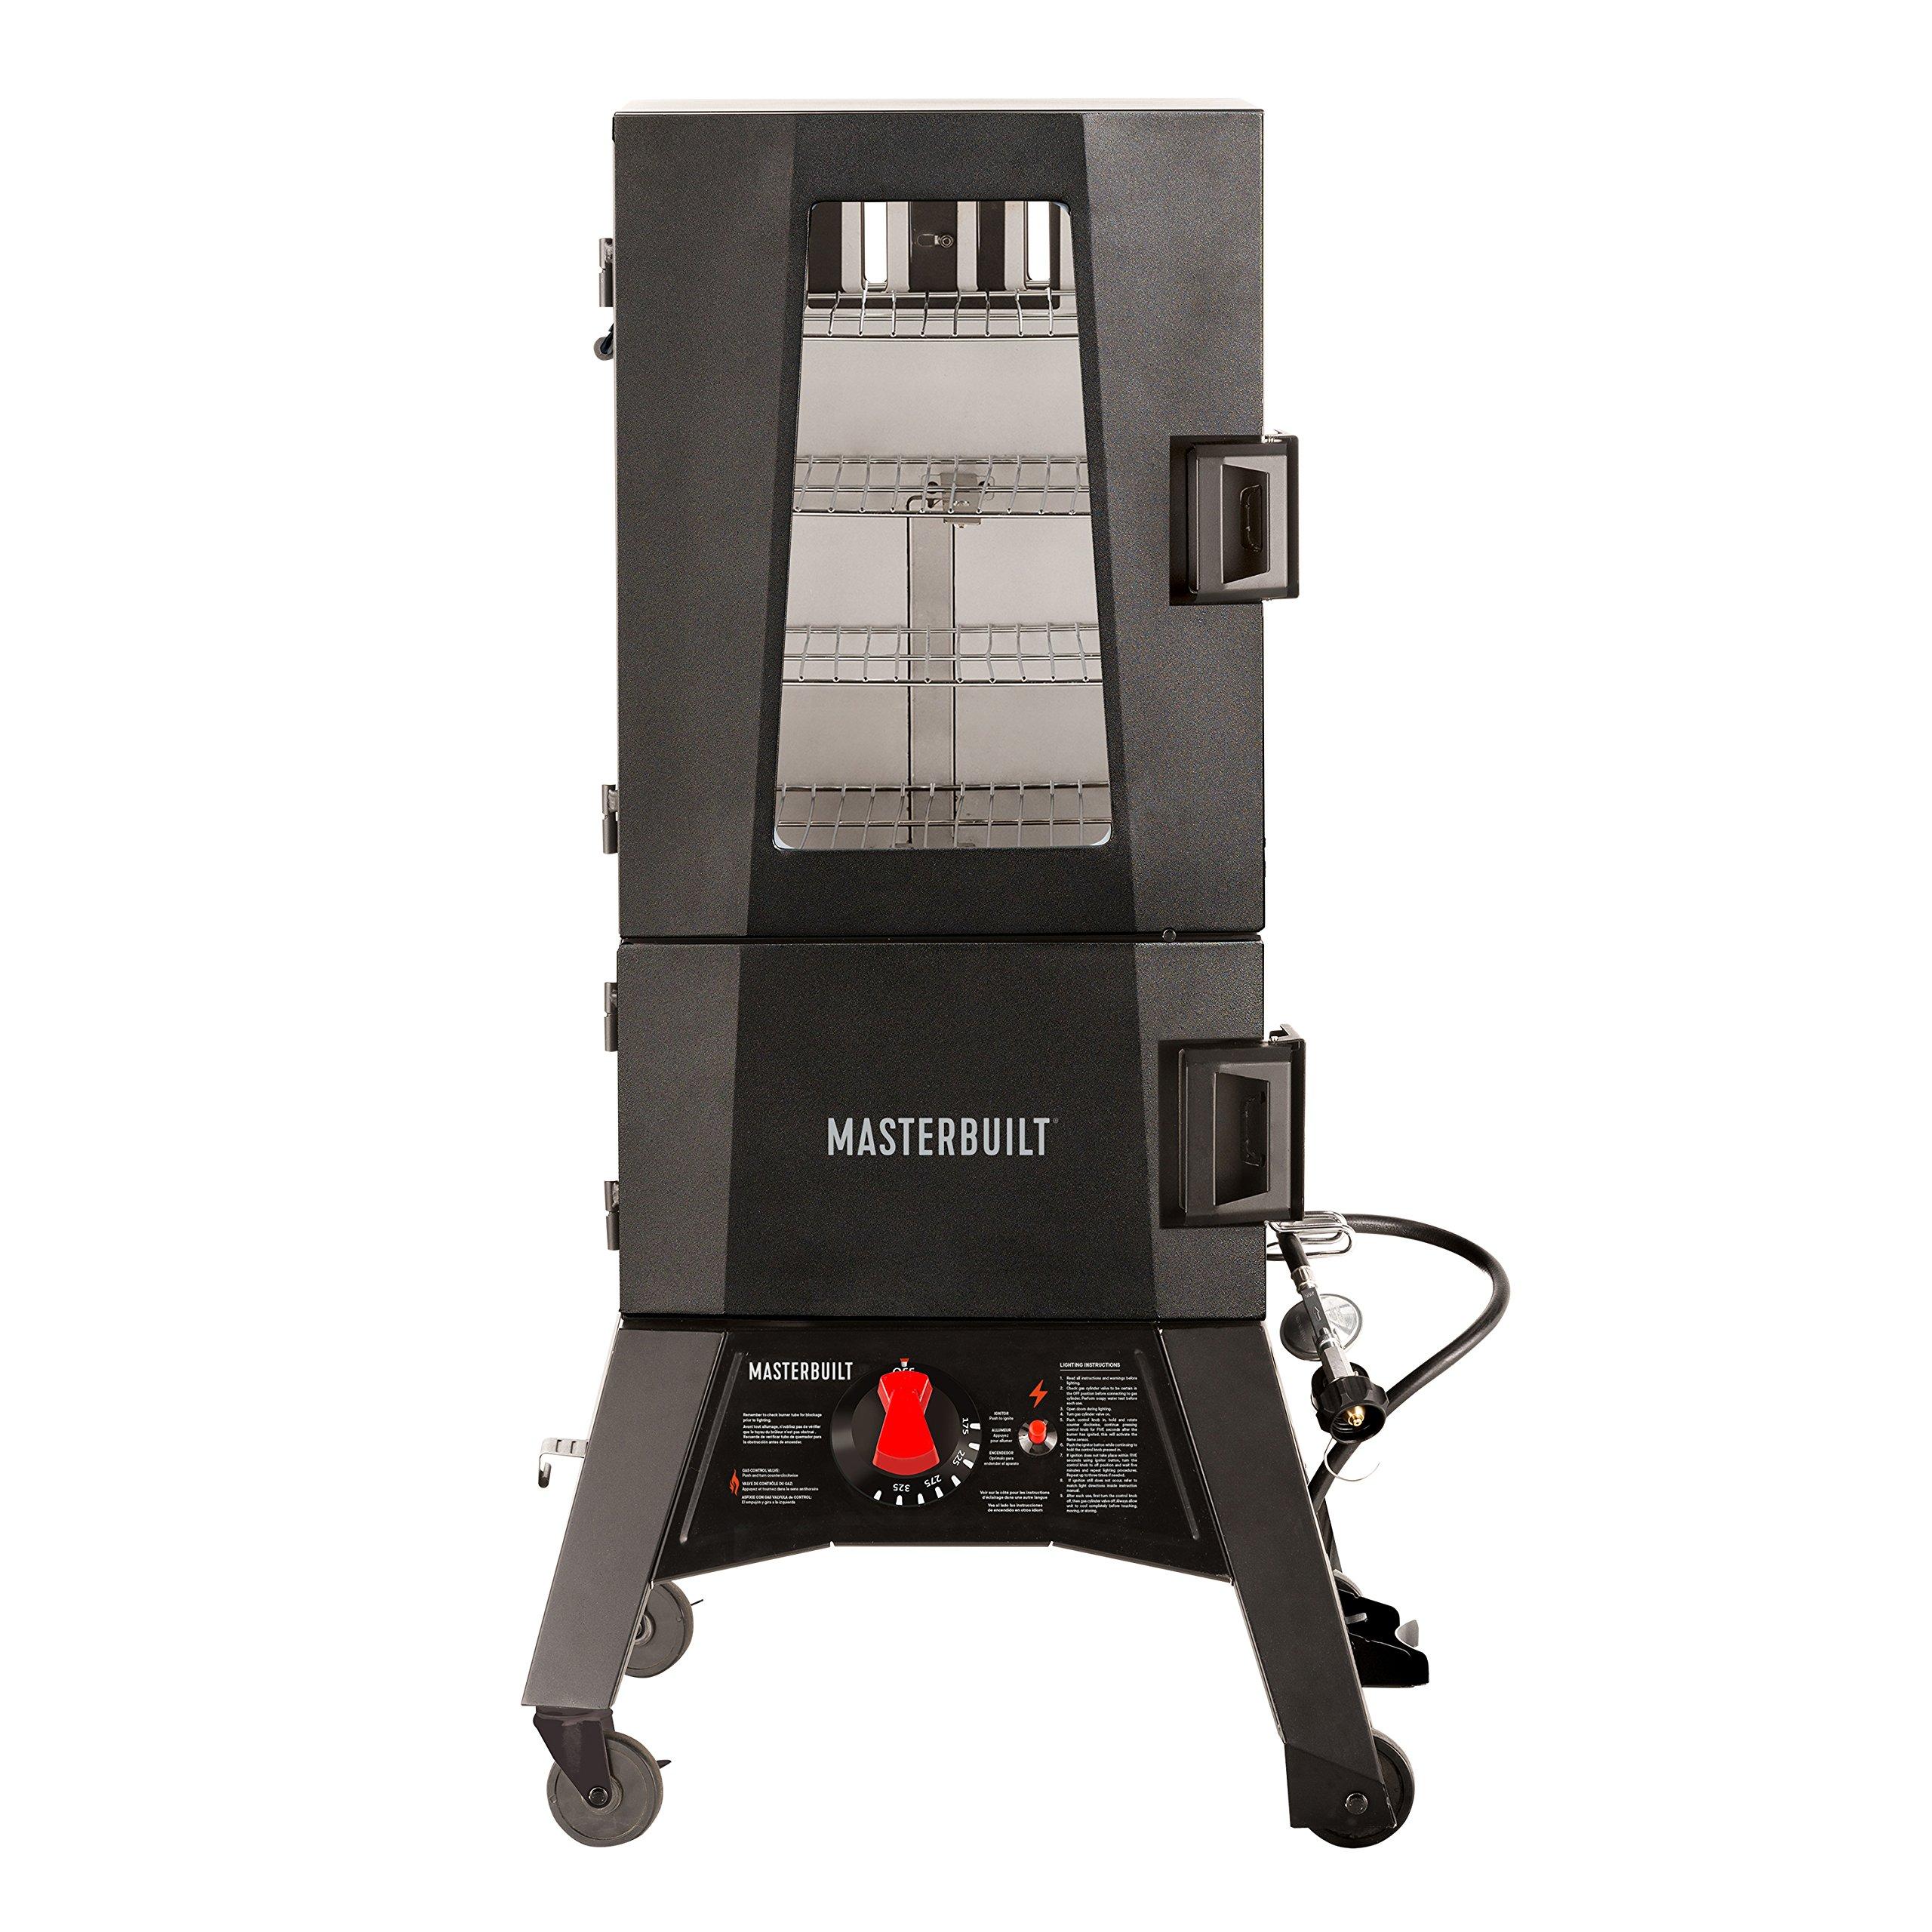 Masterbuilt MB20050716 Mps 330g Thermotemp Propane Smoker, Black by Masterbuilt